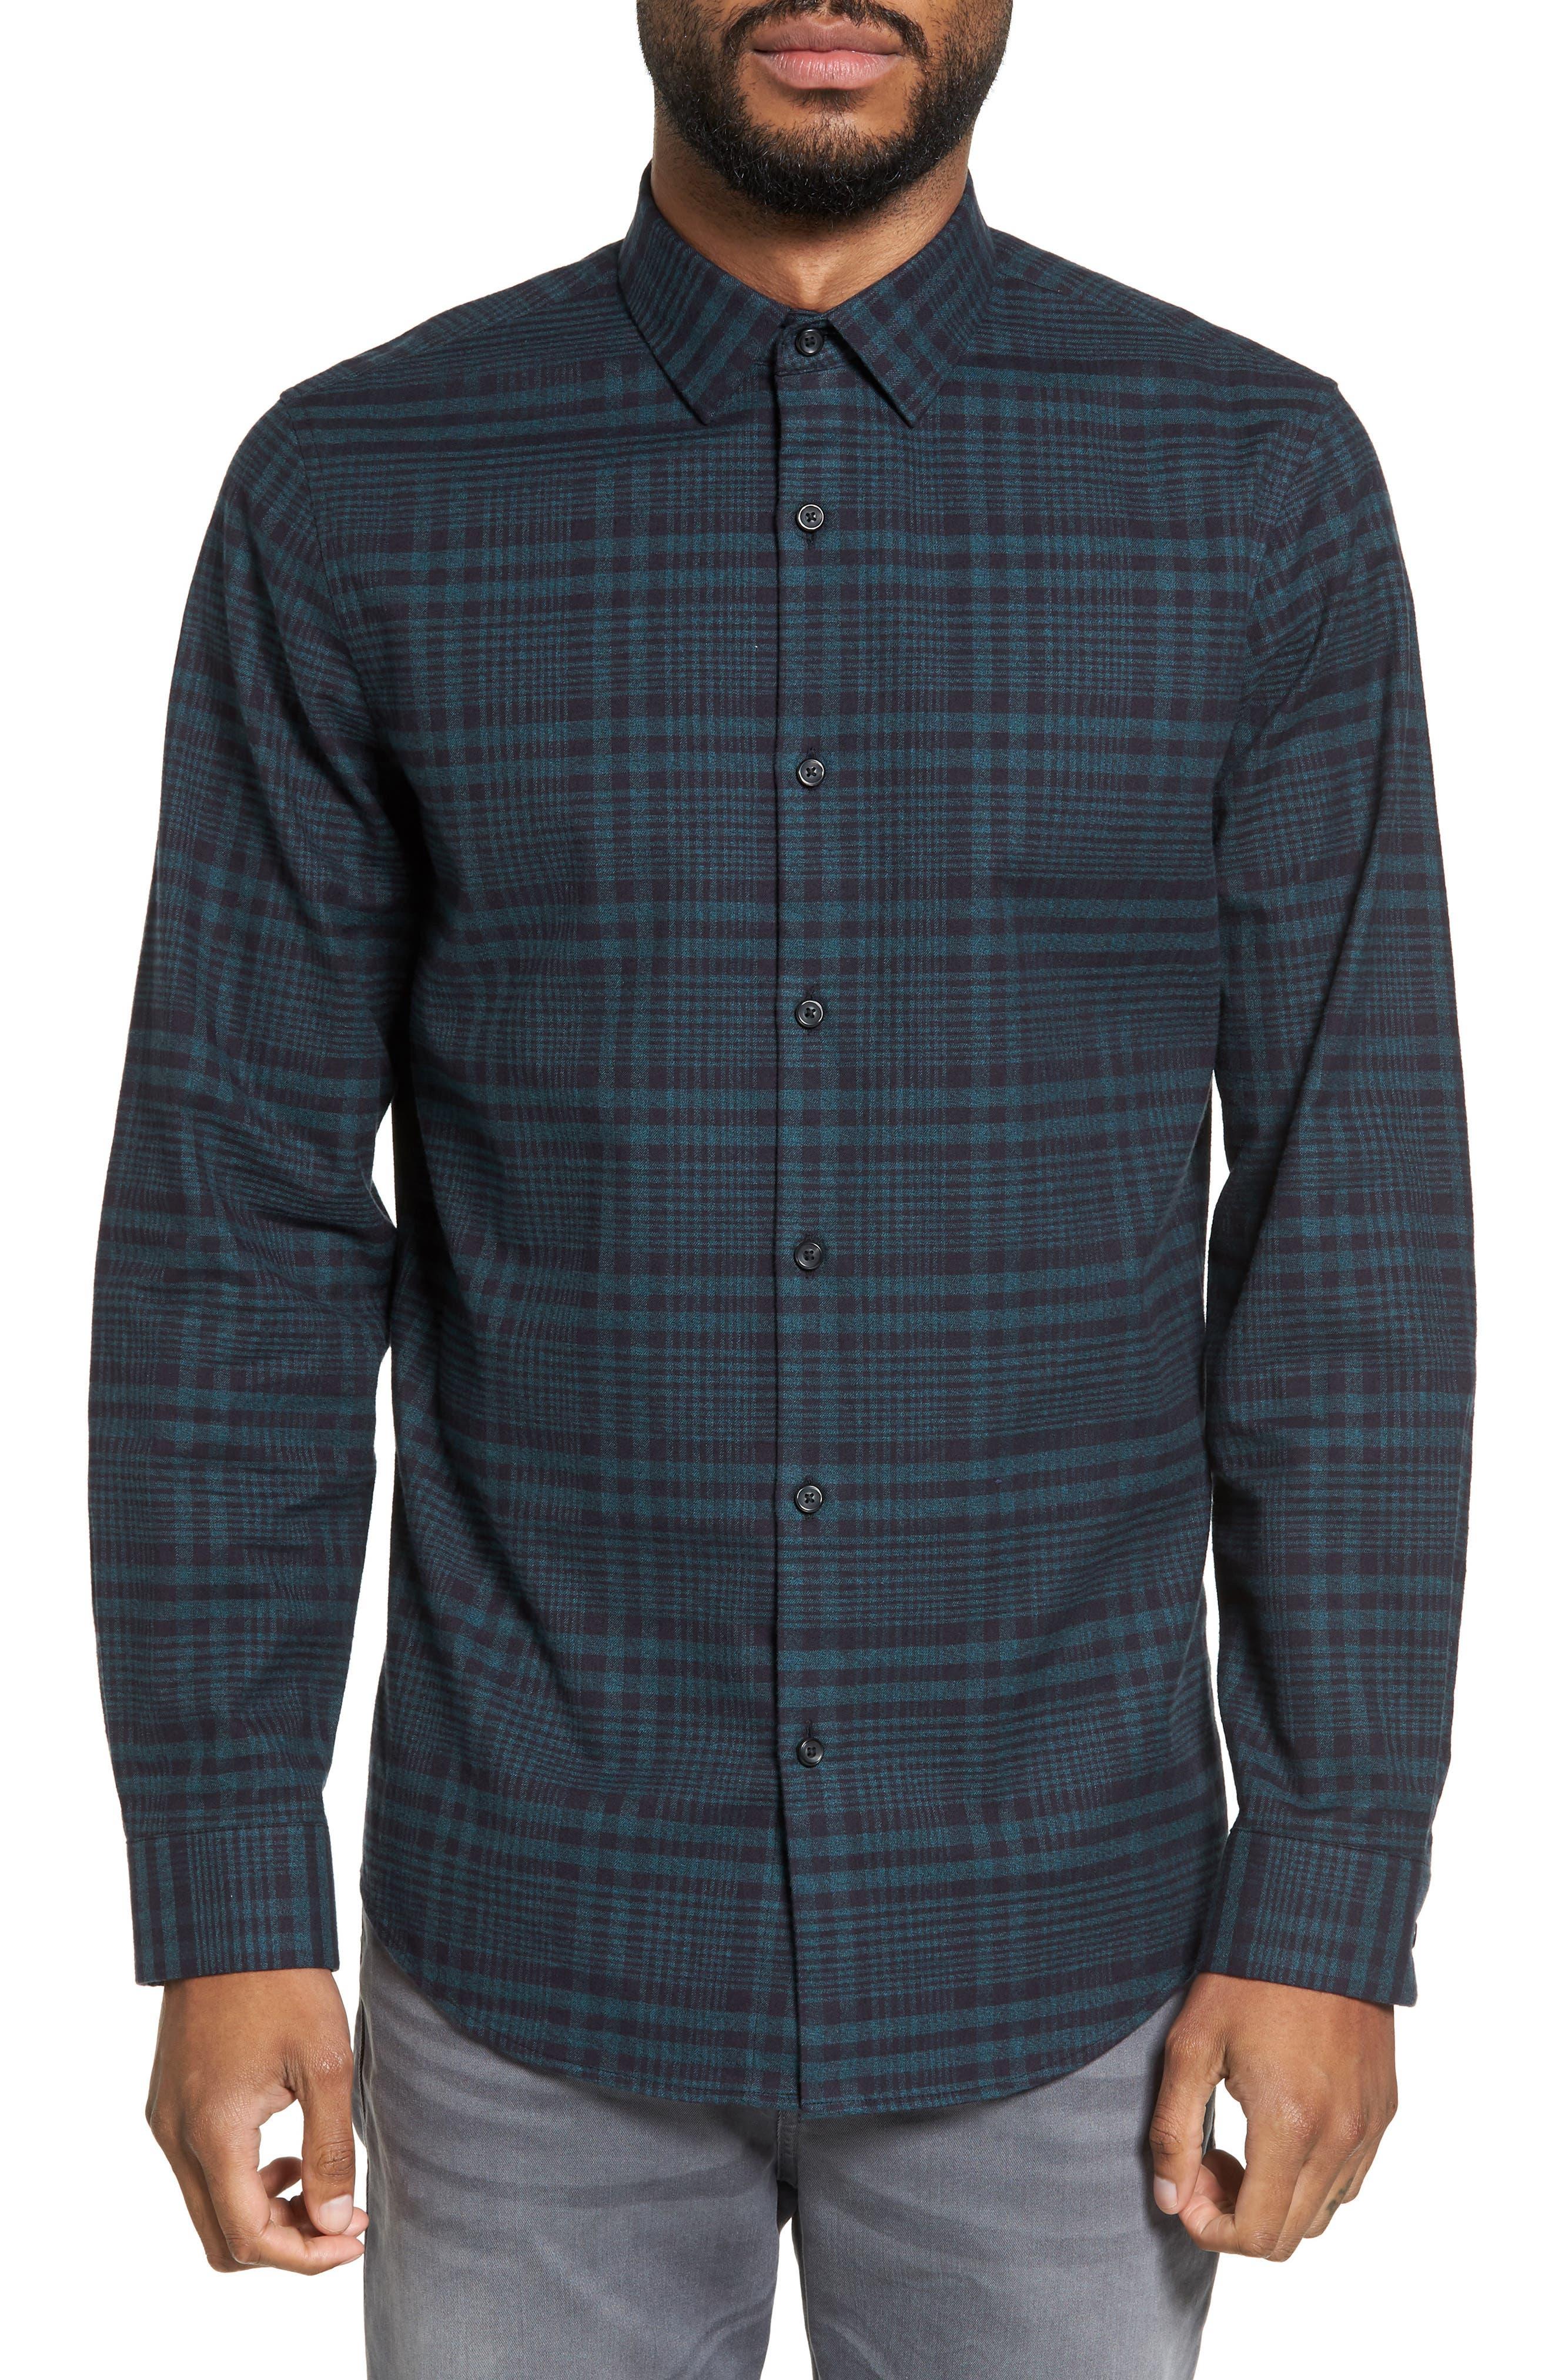 Plaid Flannel Sport Shirt,                         Main,                         color, Black Green Plaid